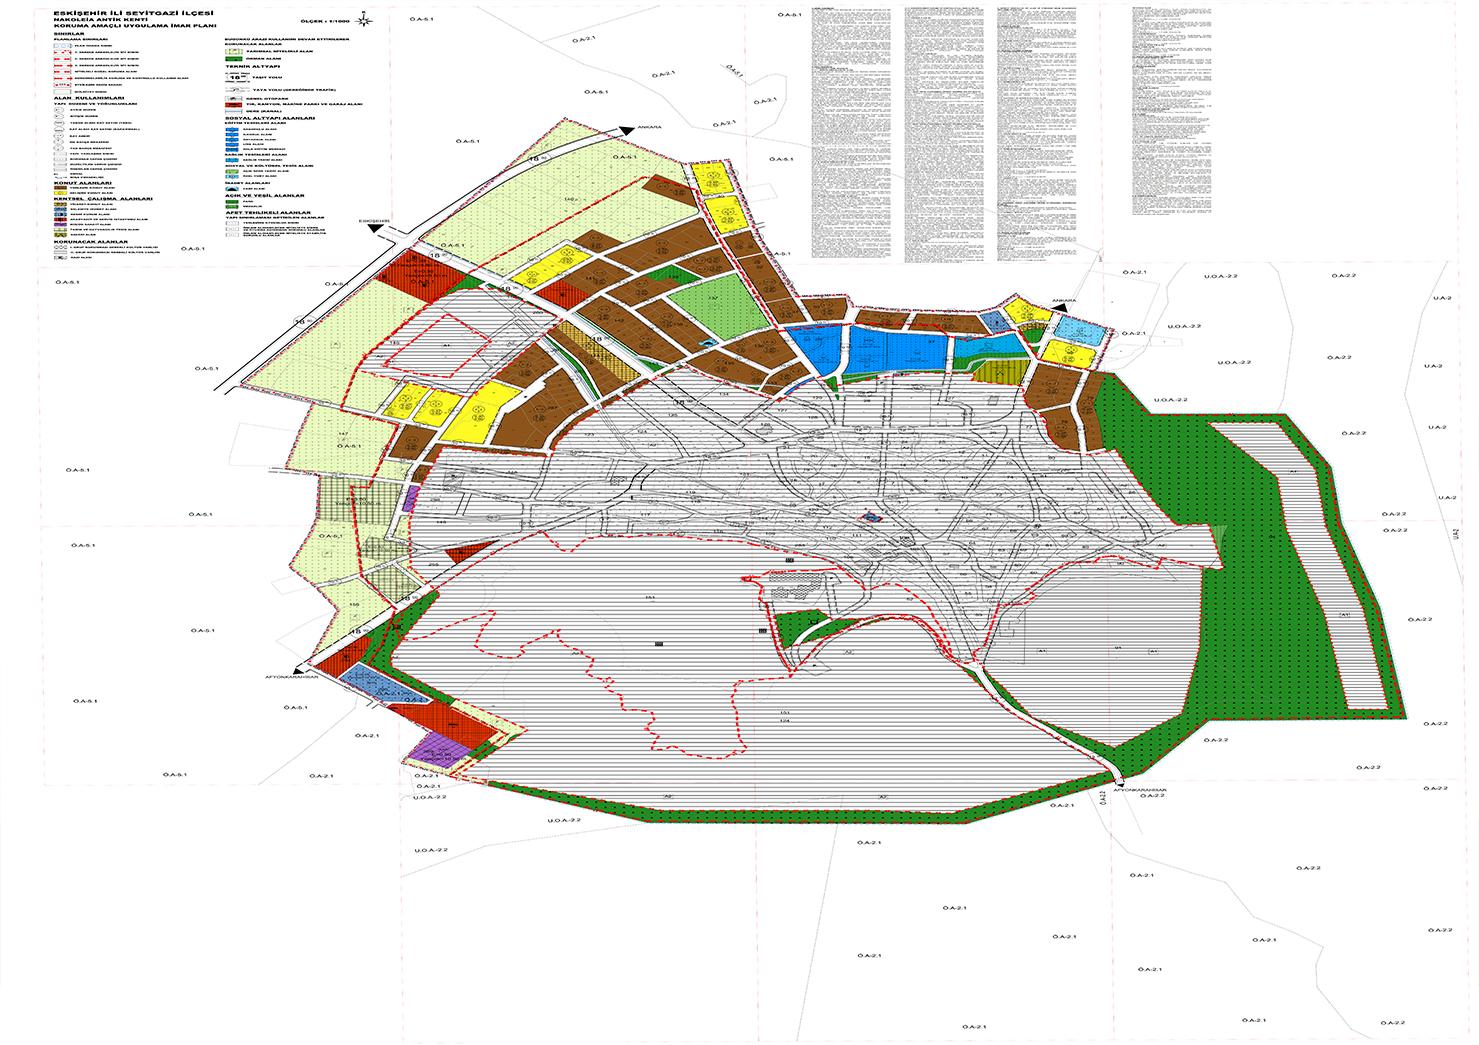 Nakoleia (Seyitgazi) Koruma Amaçlı İmar Planı